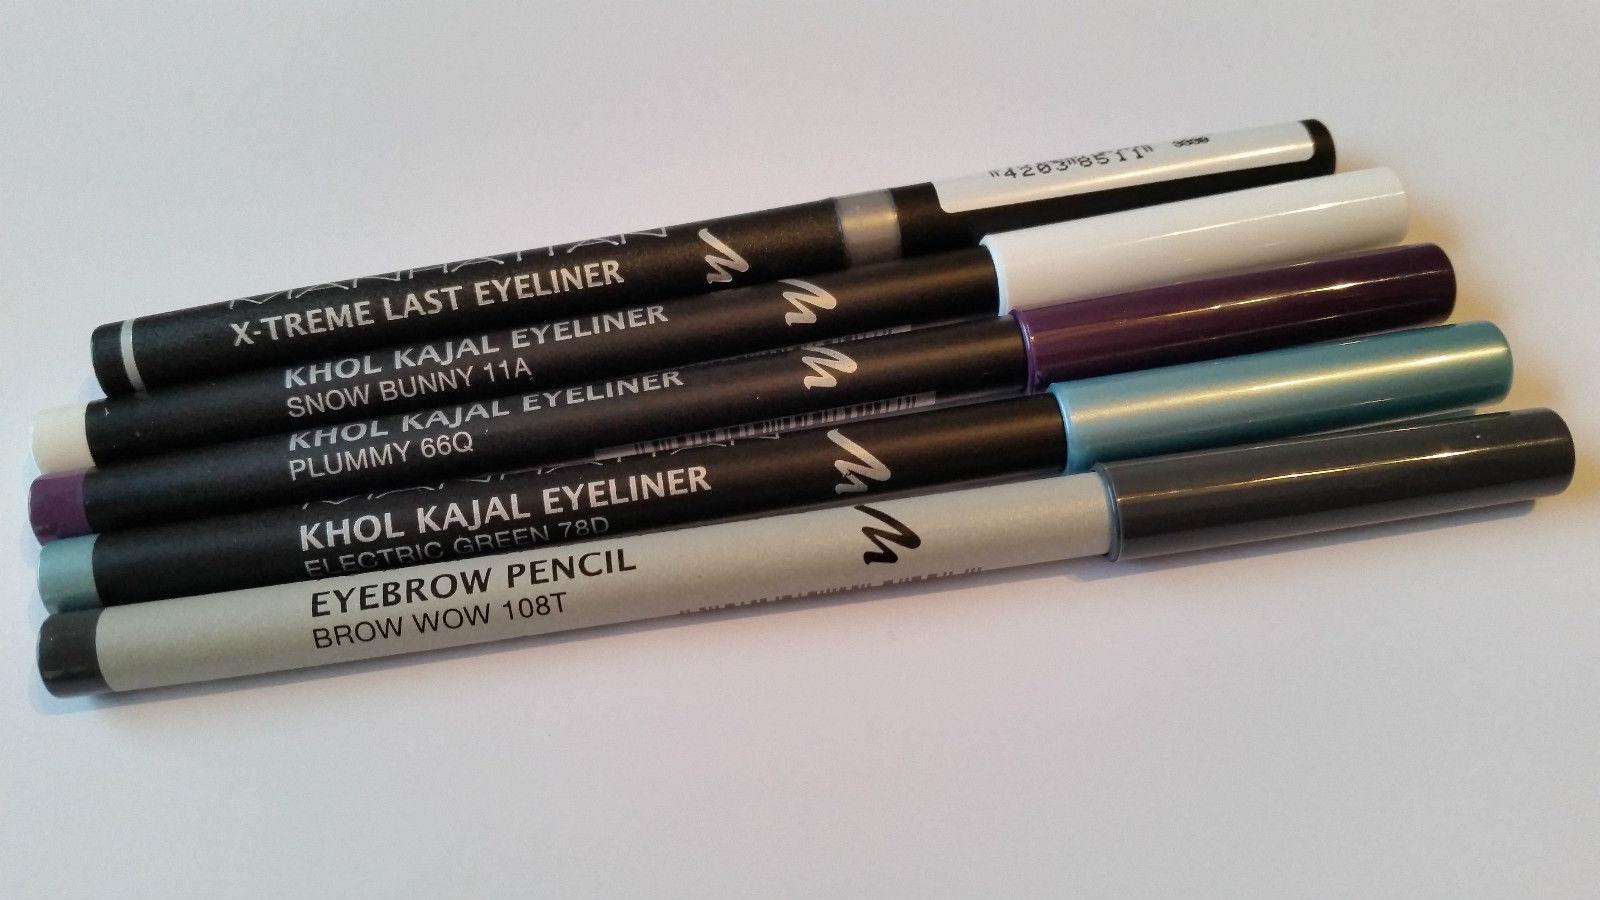 Manhattan Xtreme Last Eyeliner Khol Kajal Eye Liner Eyebrow Pencil